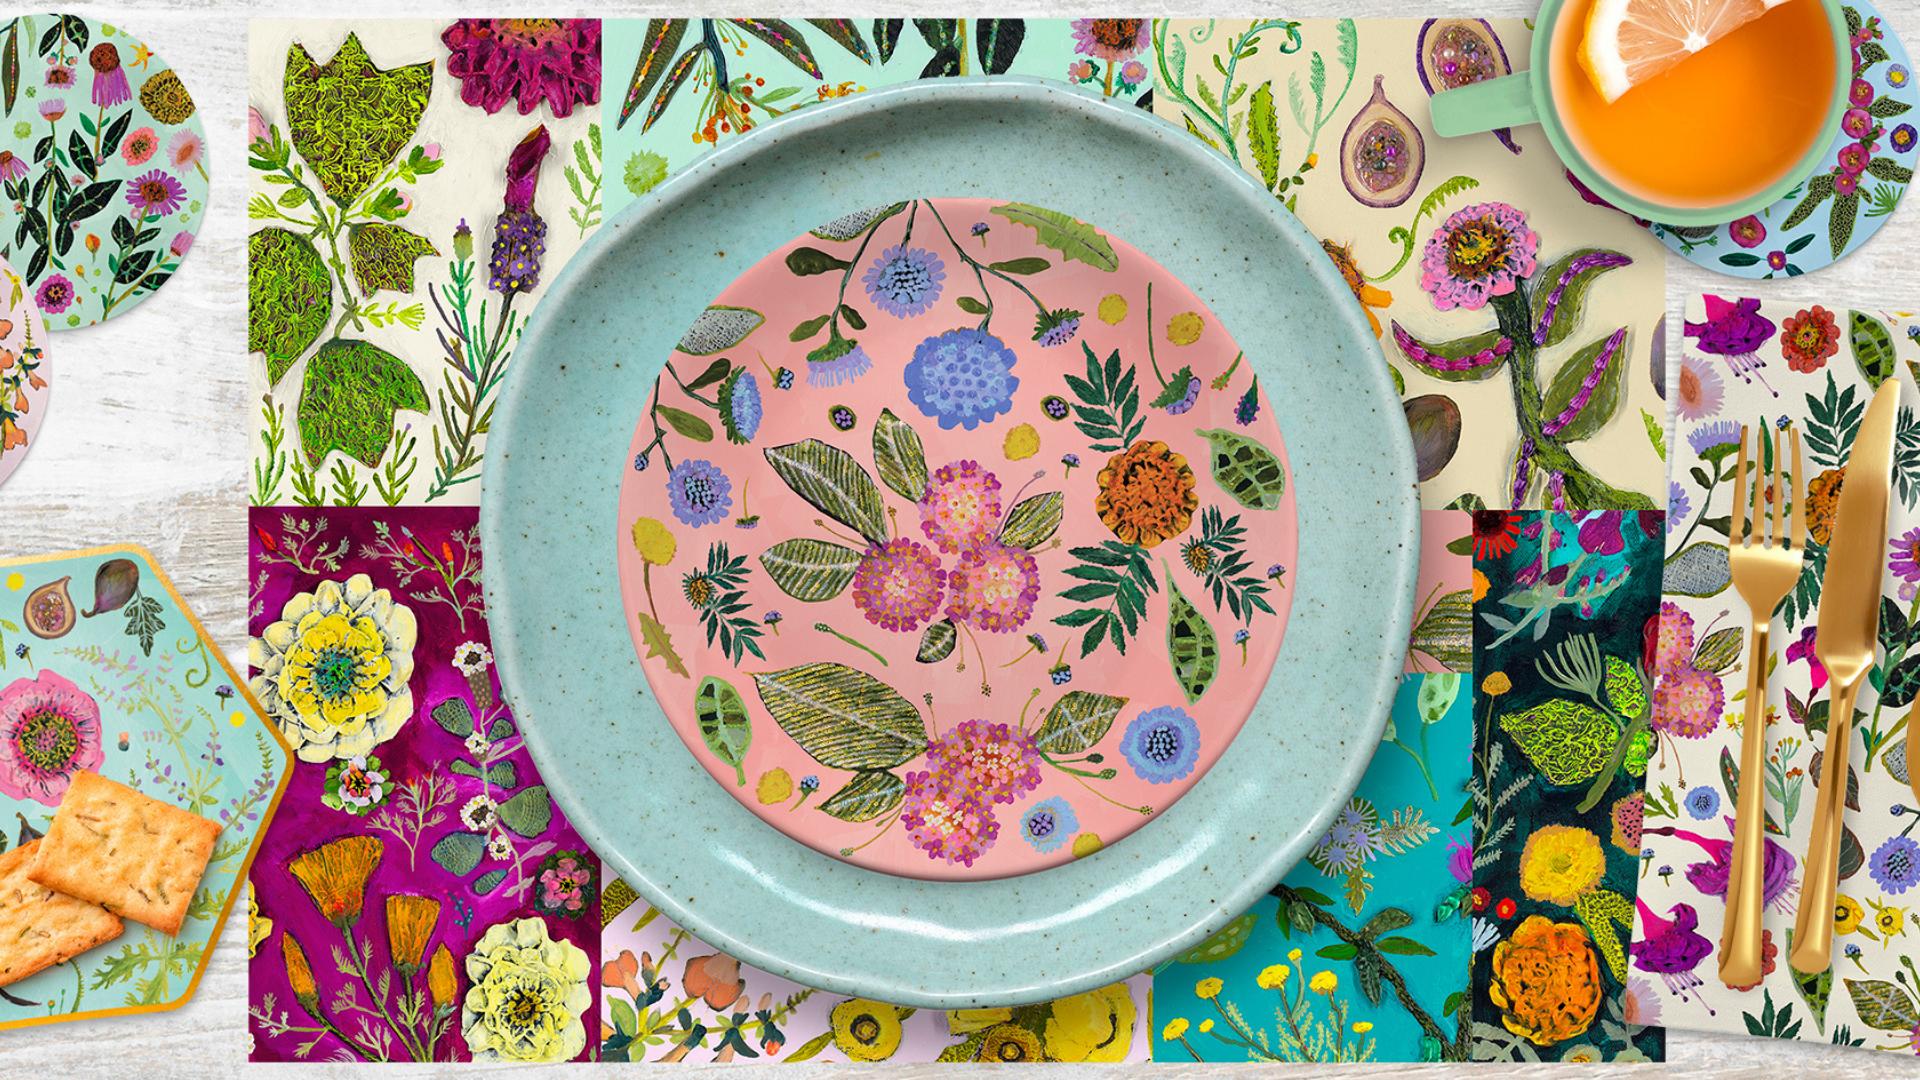 GreenBox-Tabletop_Wildflowers_1920x1080.